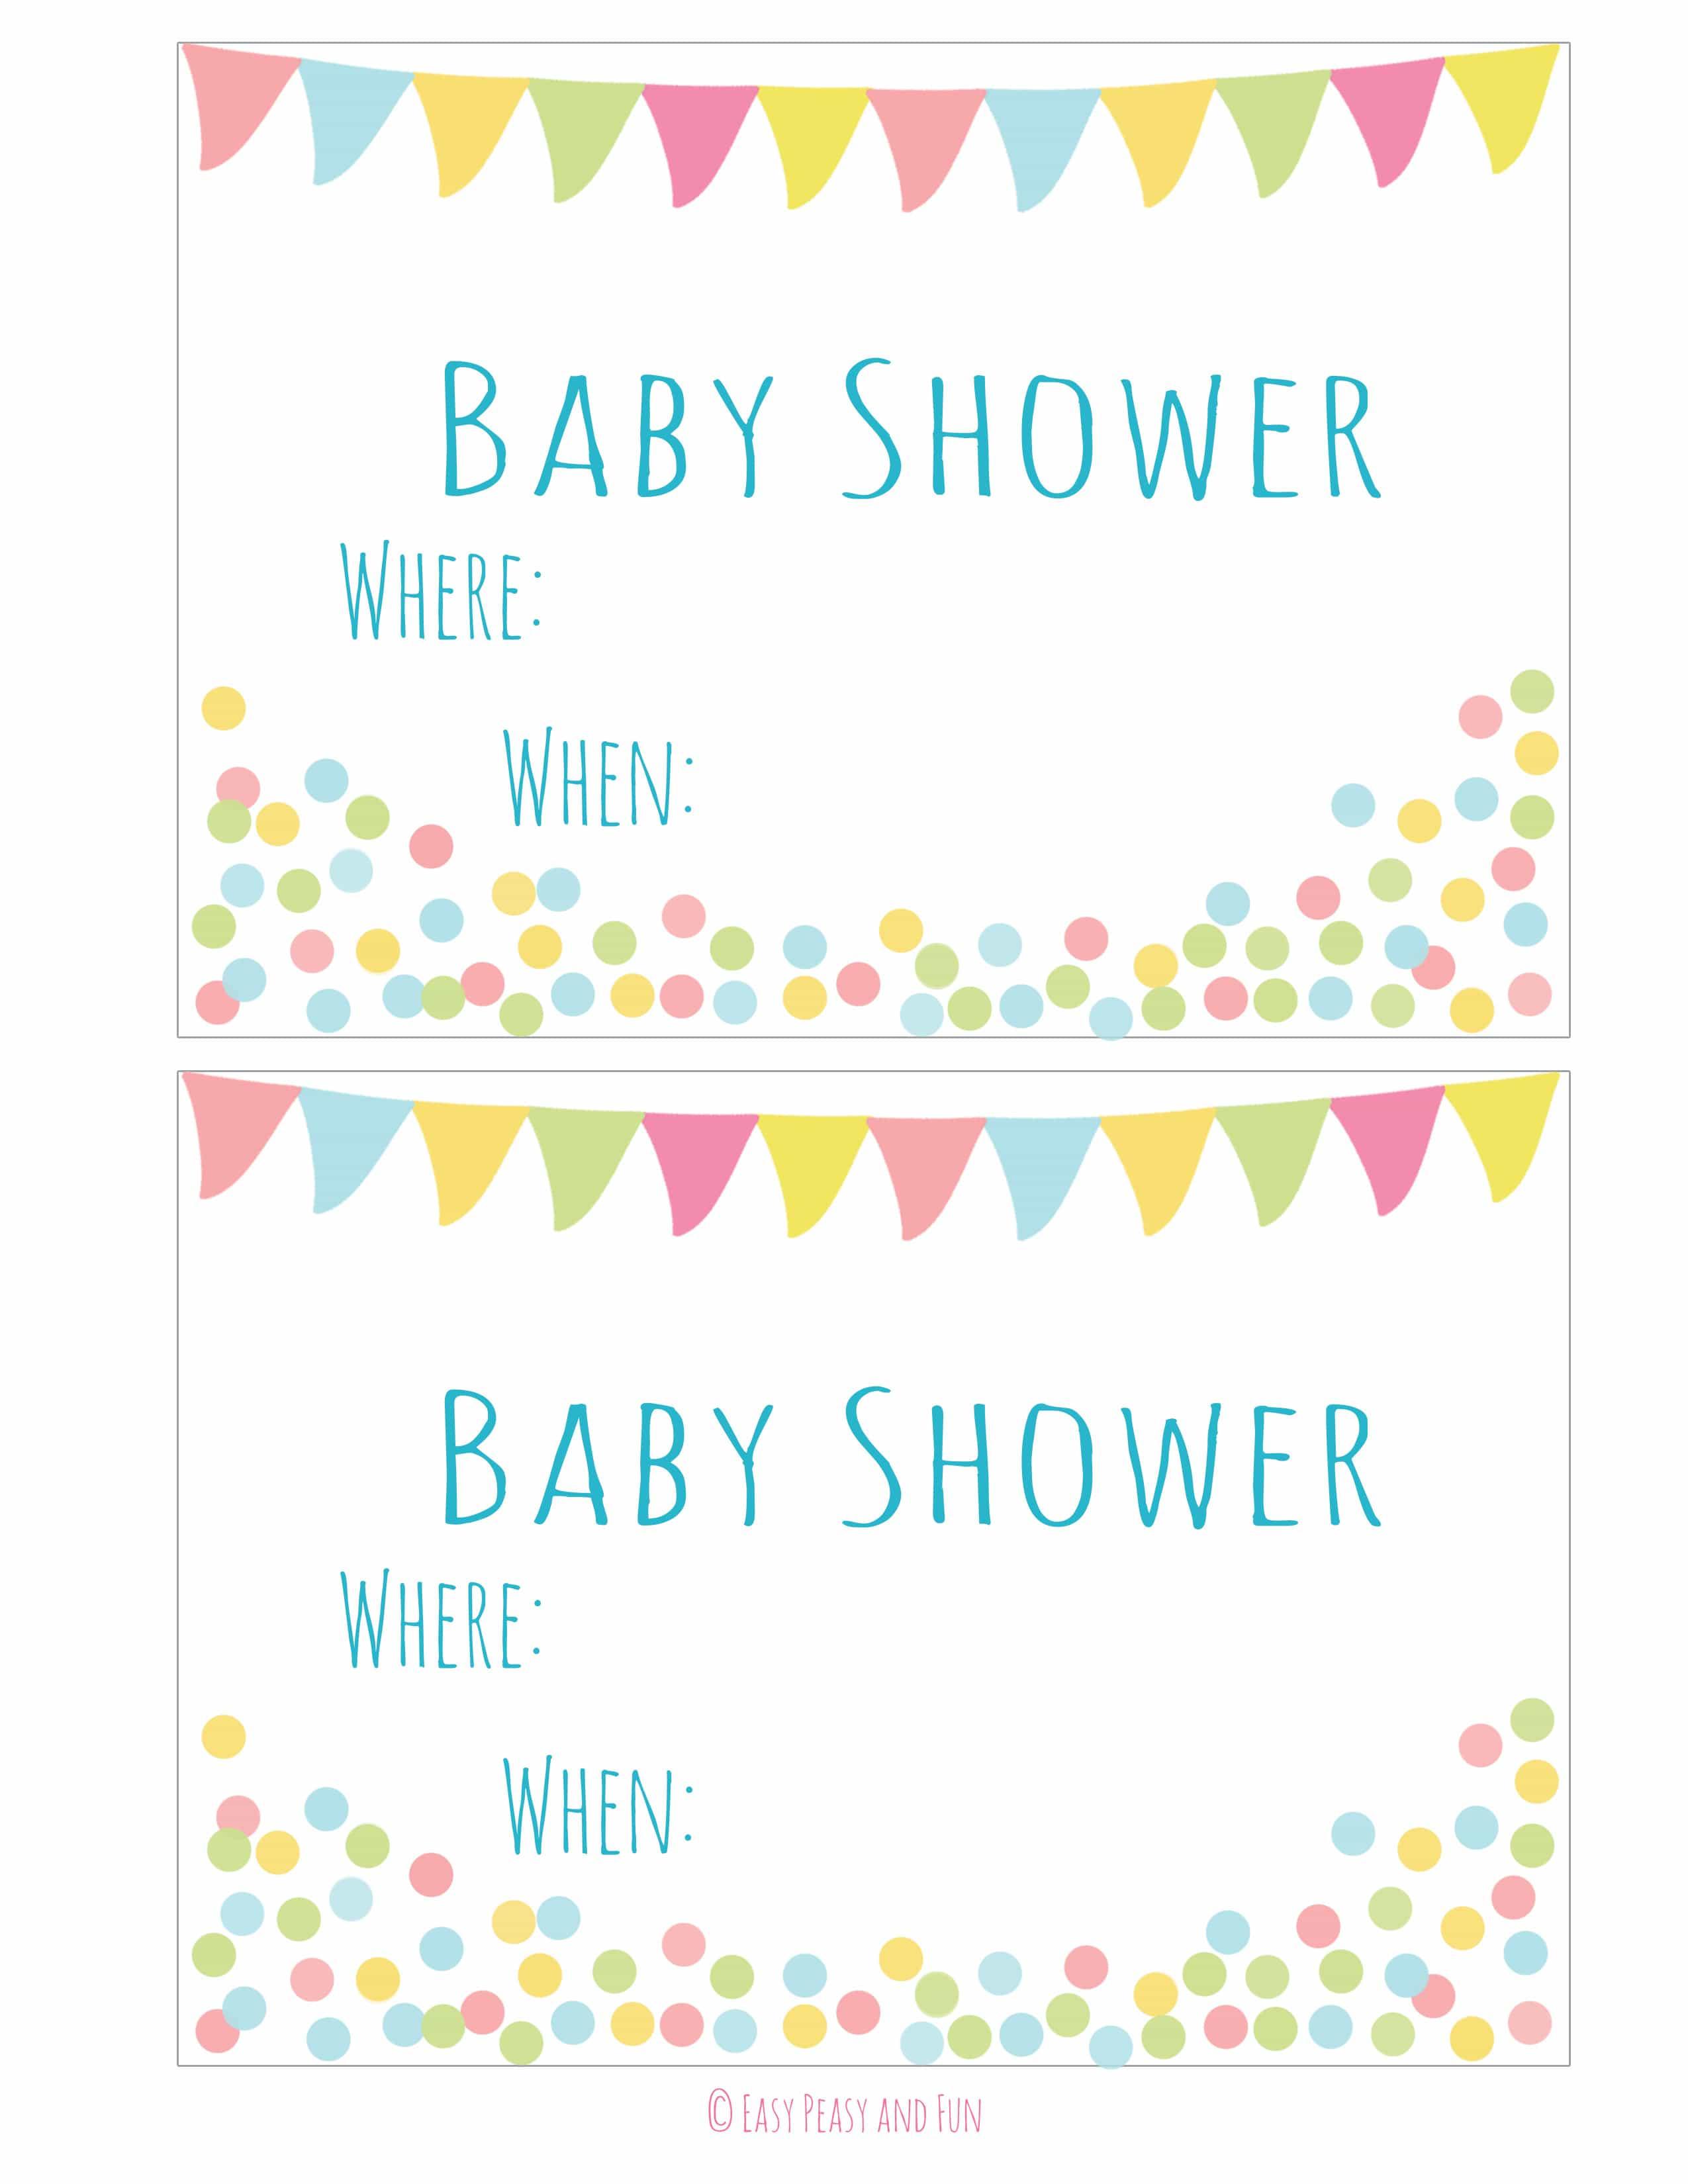 Free Printable Baby Shower Invitation - Easy Peasy And Fun - Free Printable Blank Baby Shower Invitations